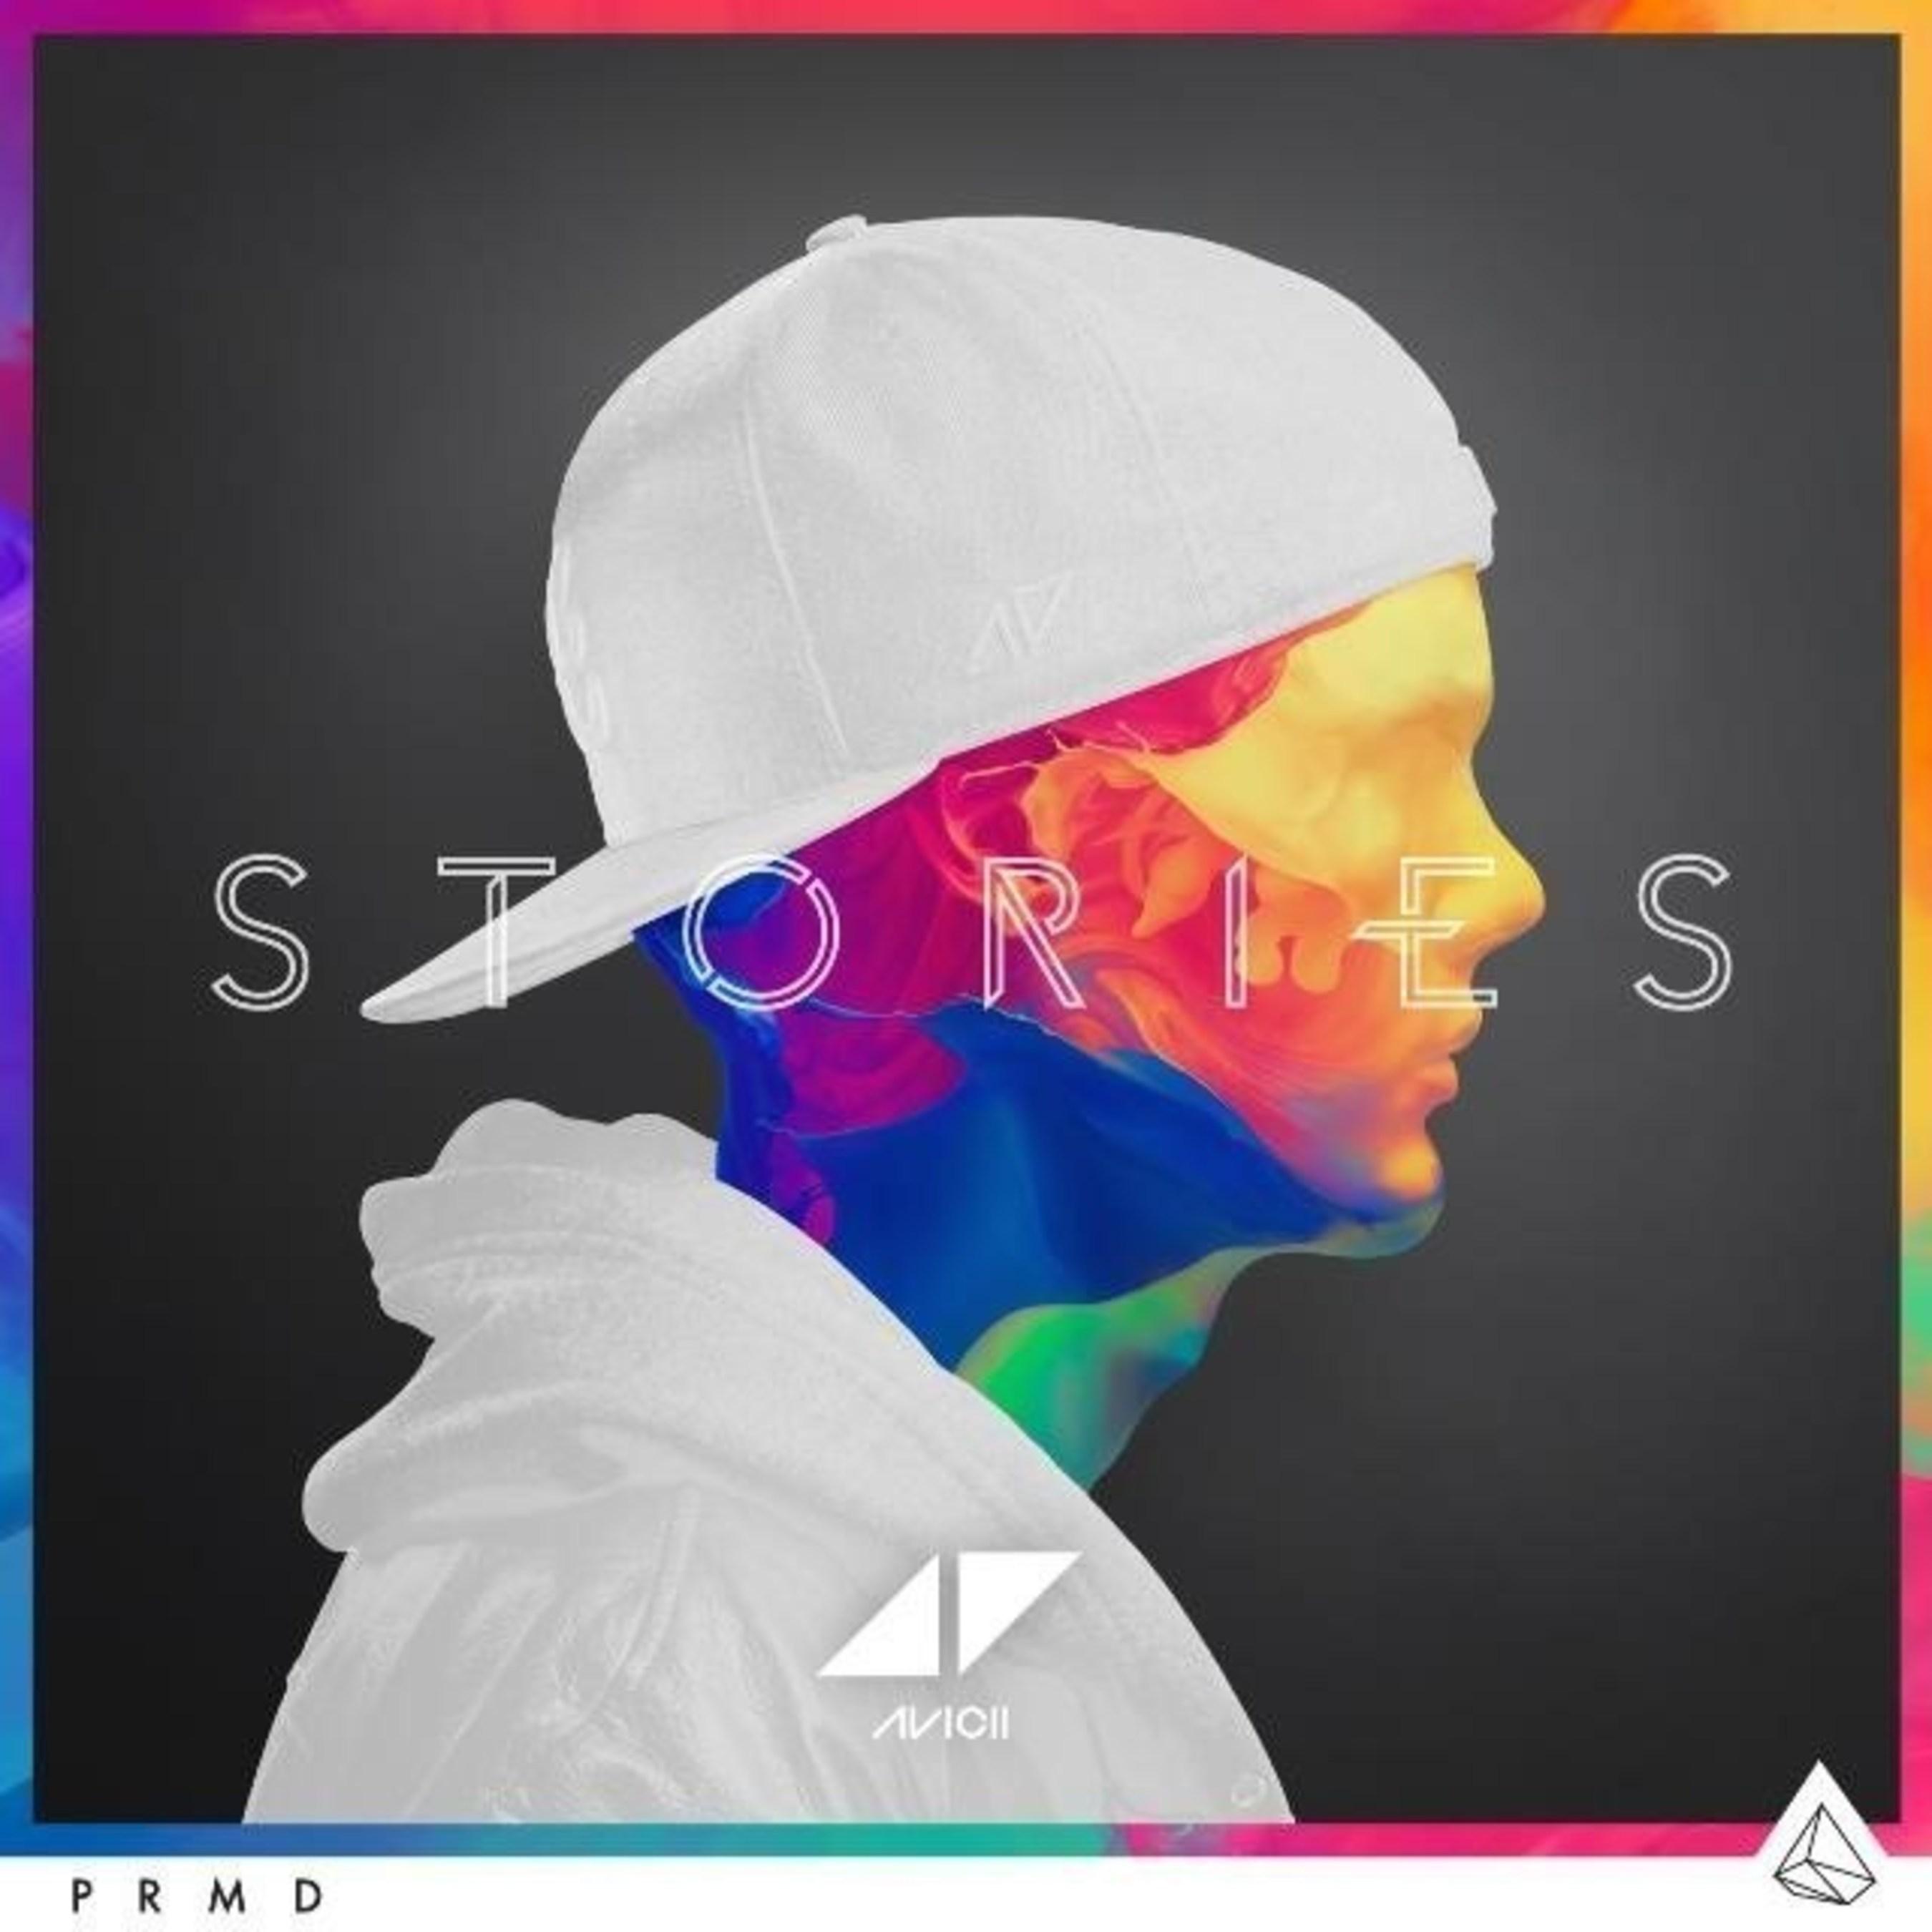 Avicii's Stories Set For October 2 Release